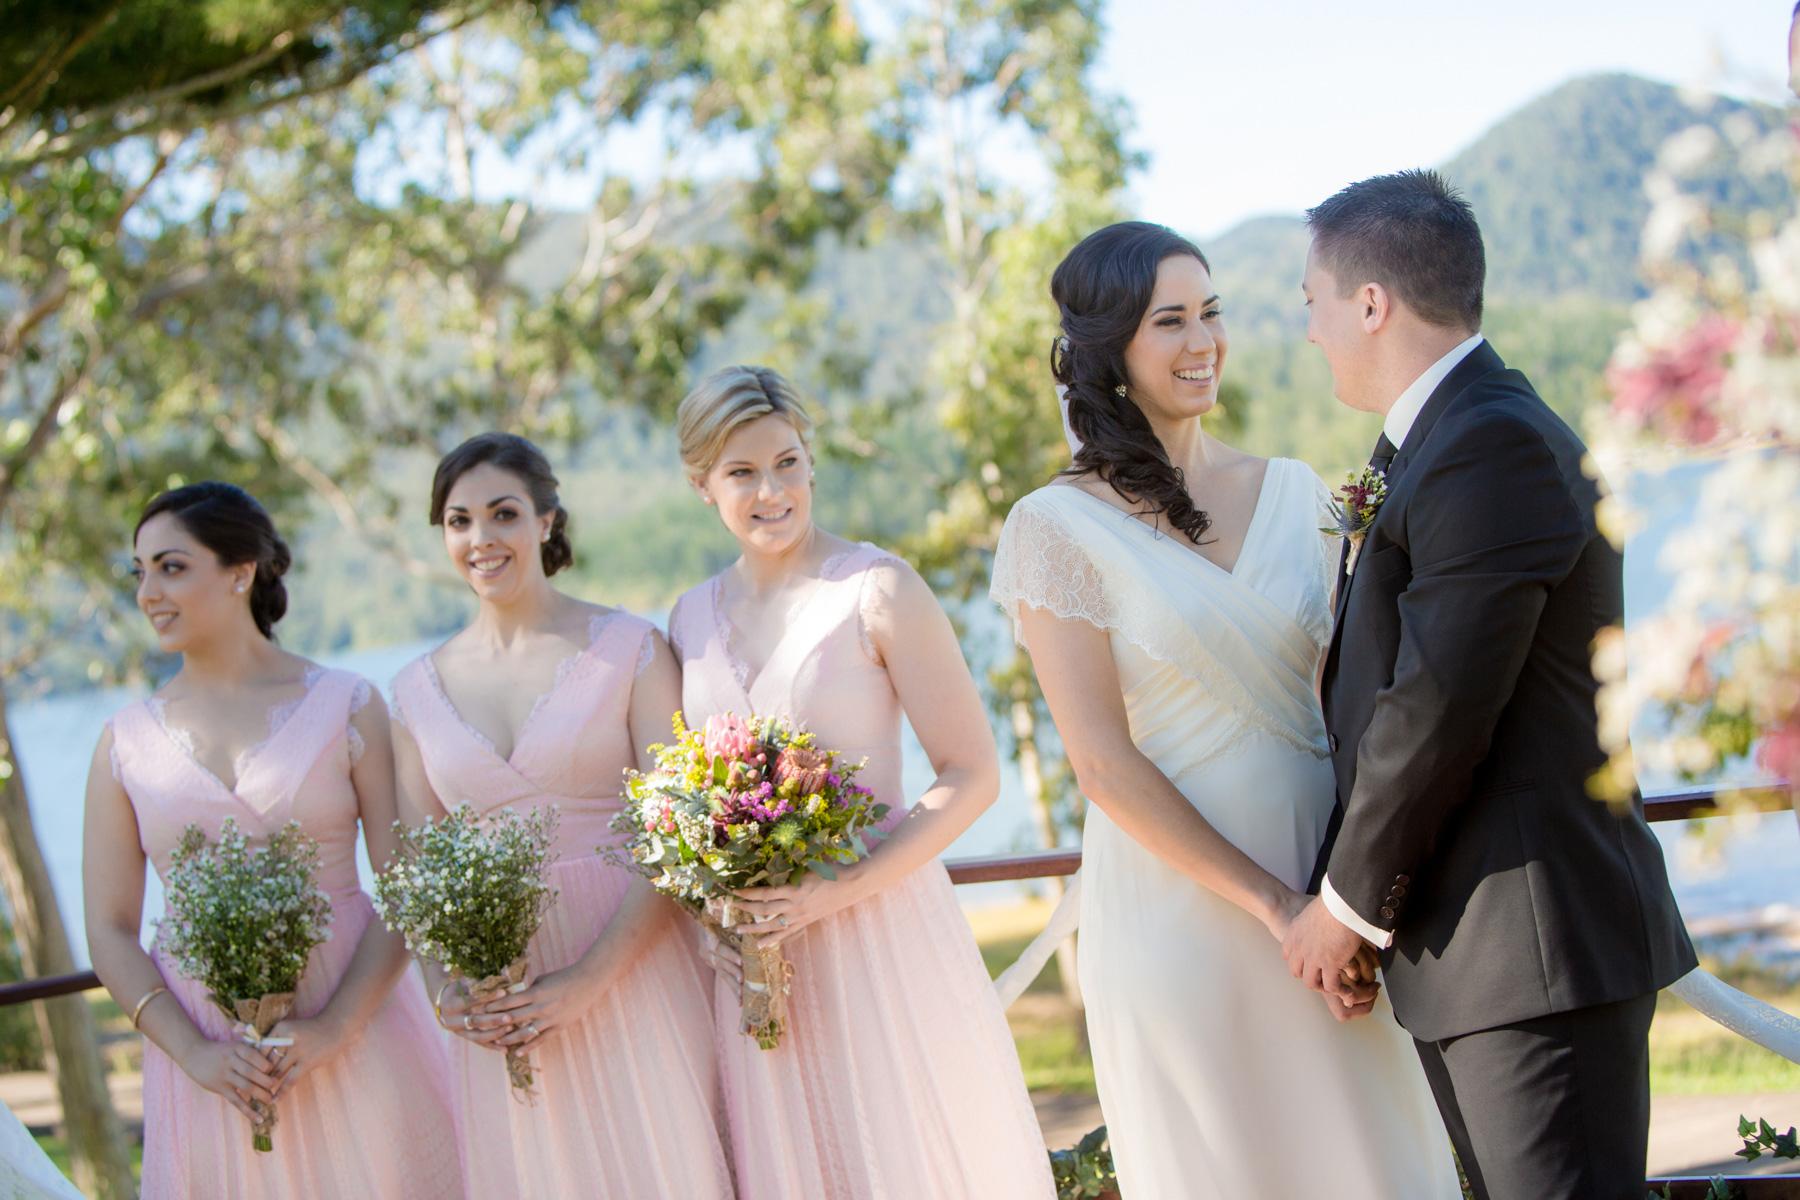 Jenna_Ray_Rustic-Wedding_021